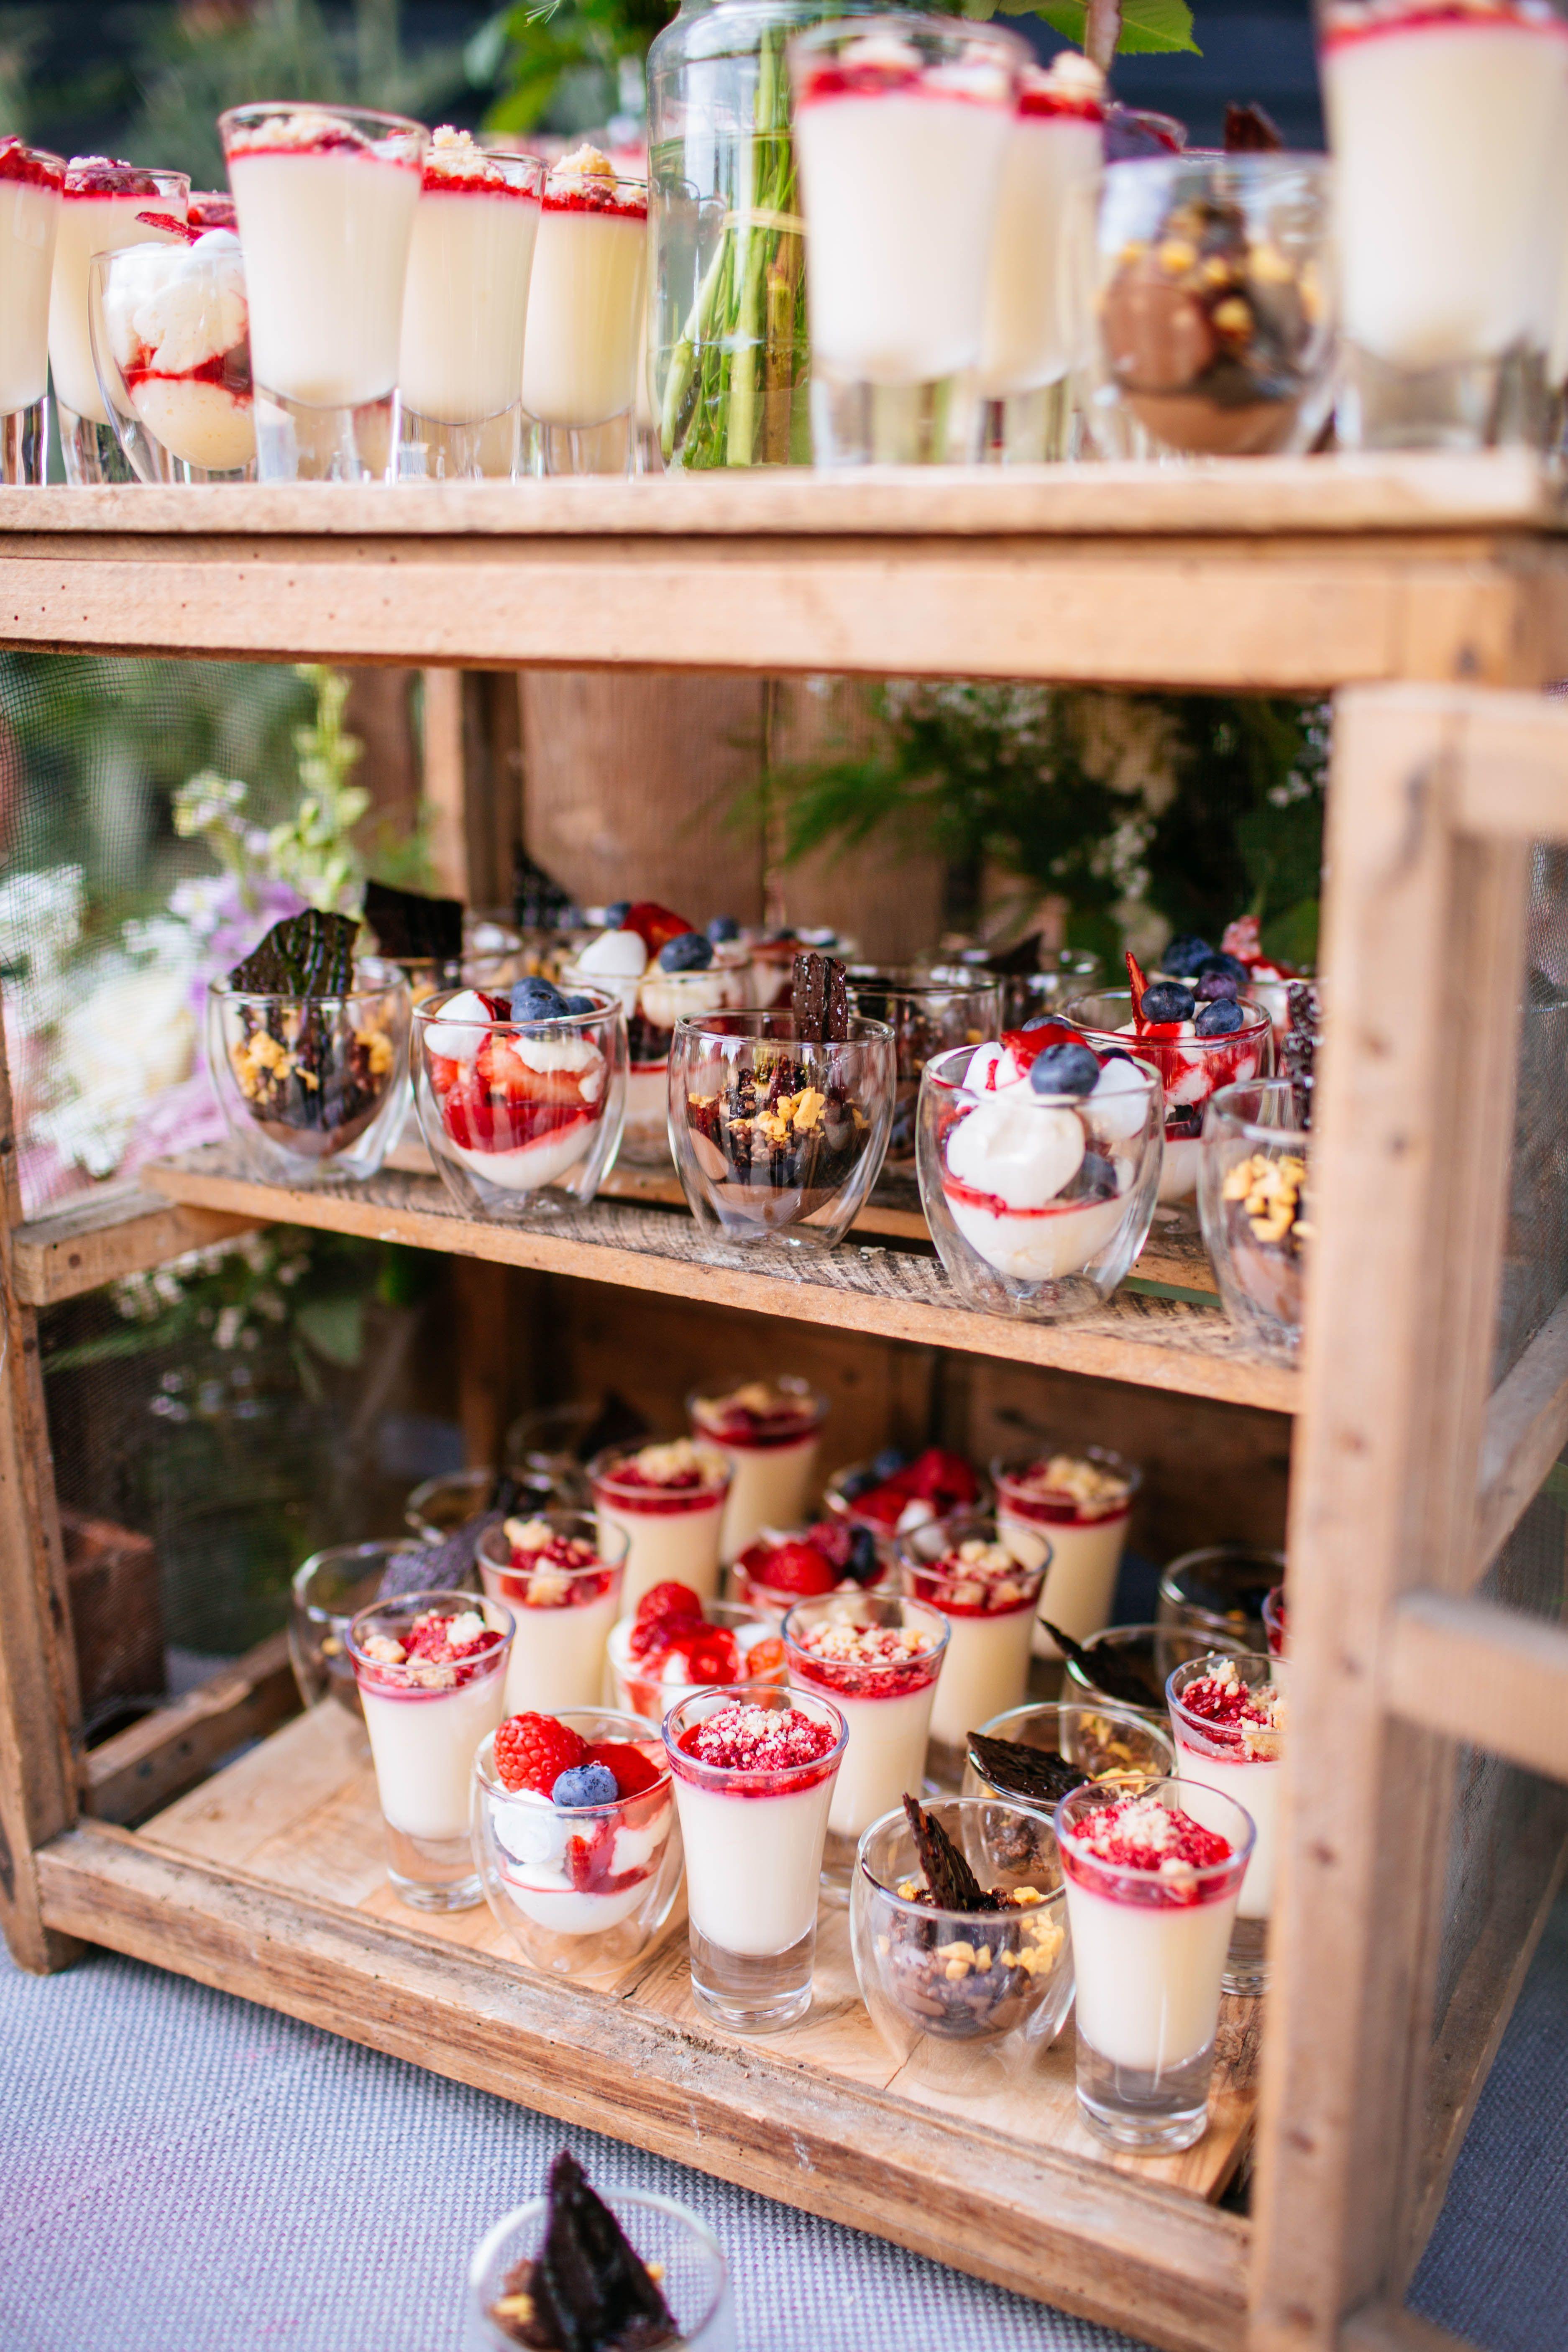 Kalm kitchen catering at helen garys wedding in july